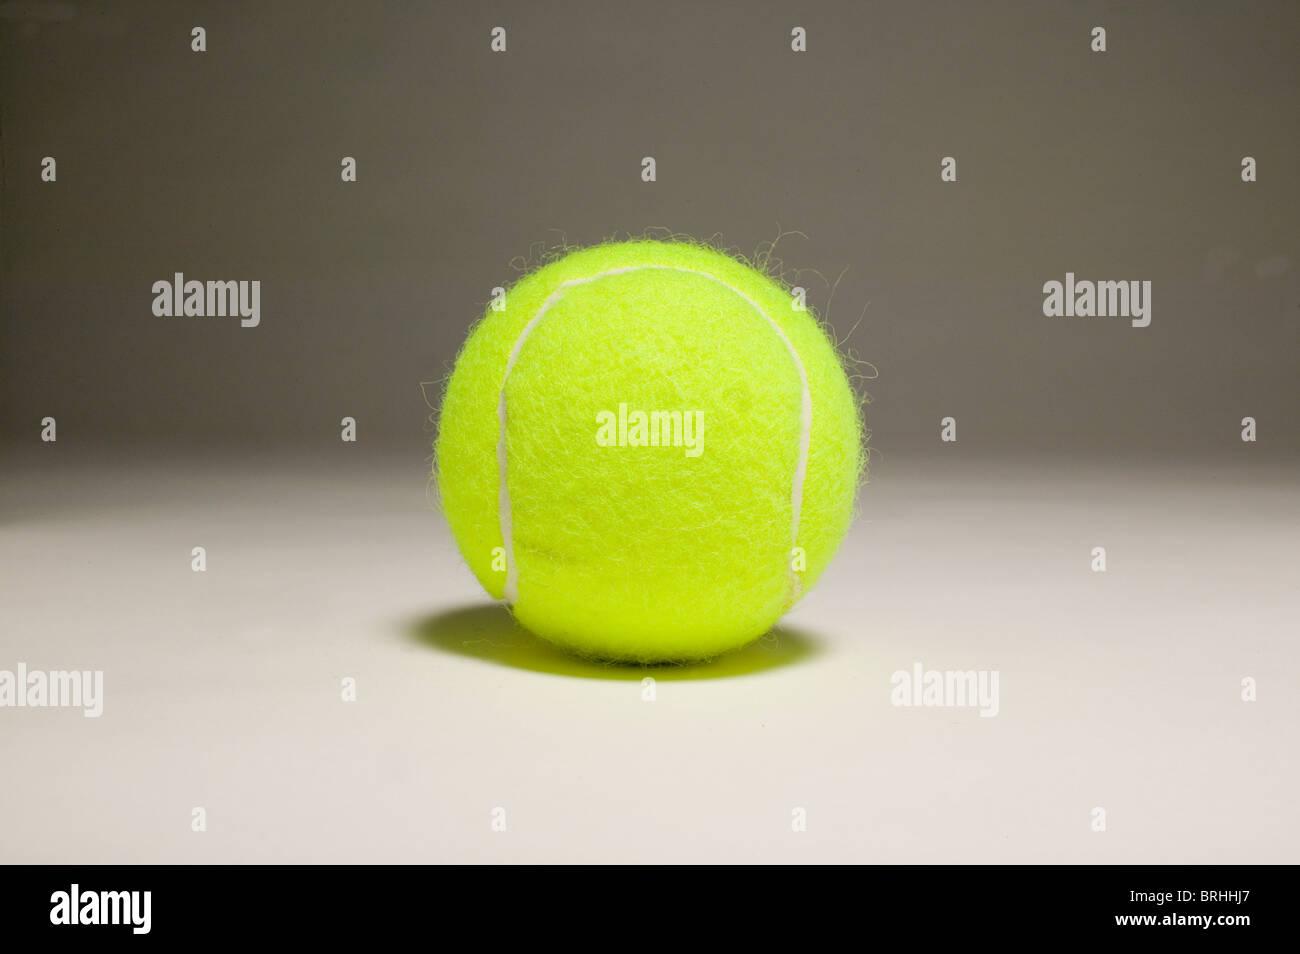 close up still life of tennis ball. - Stock Image